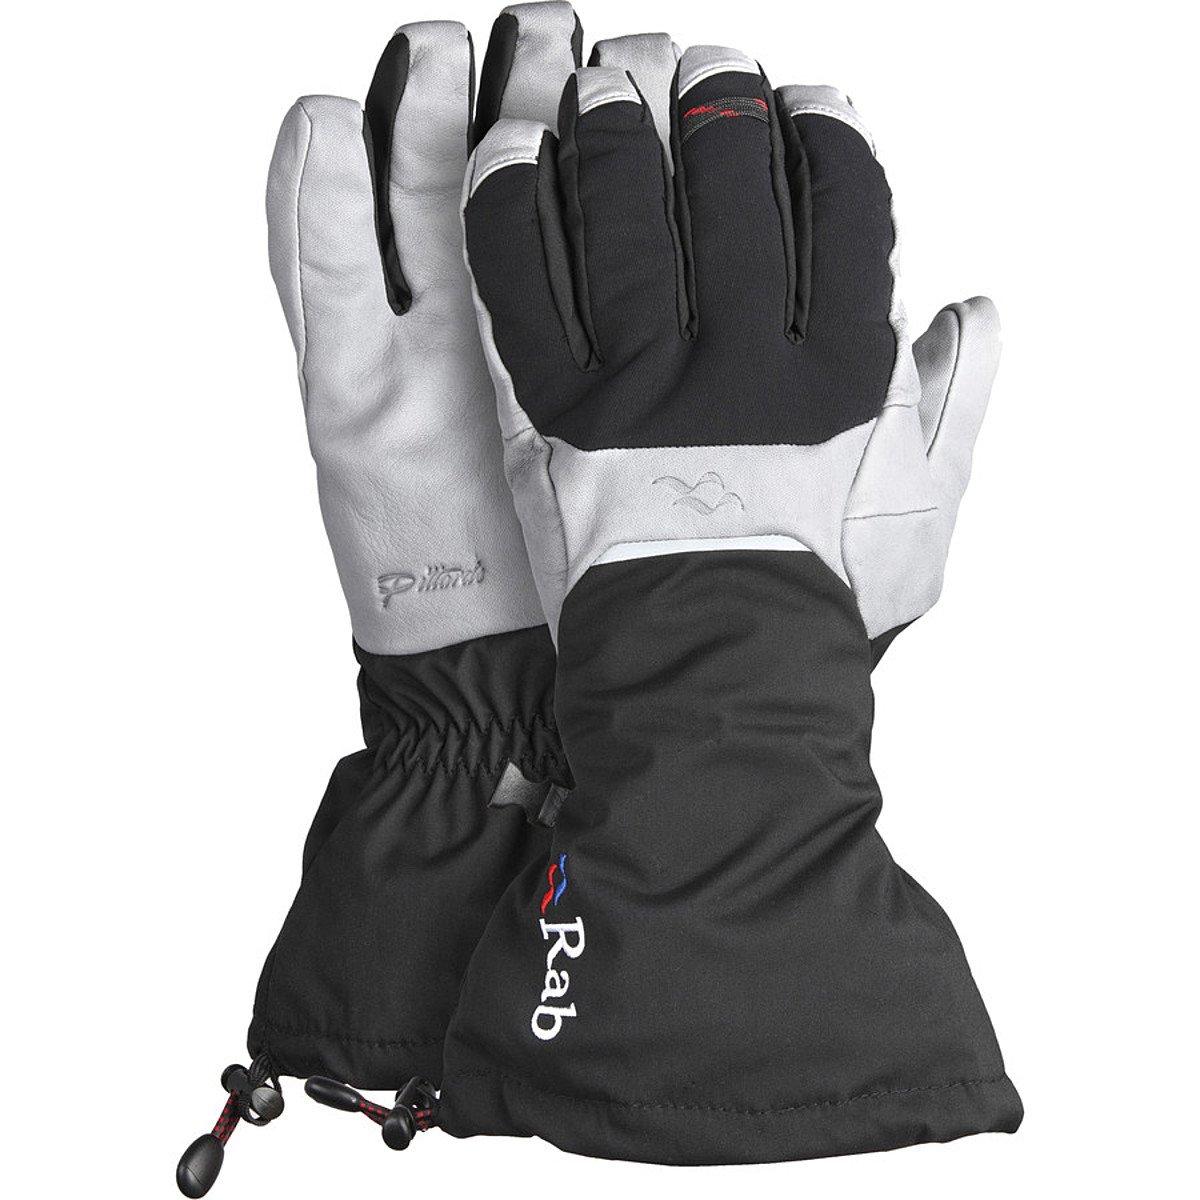 Rab Alliance Glove - Men's Black Medium